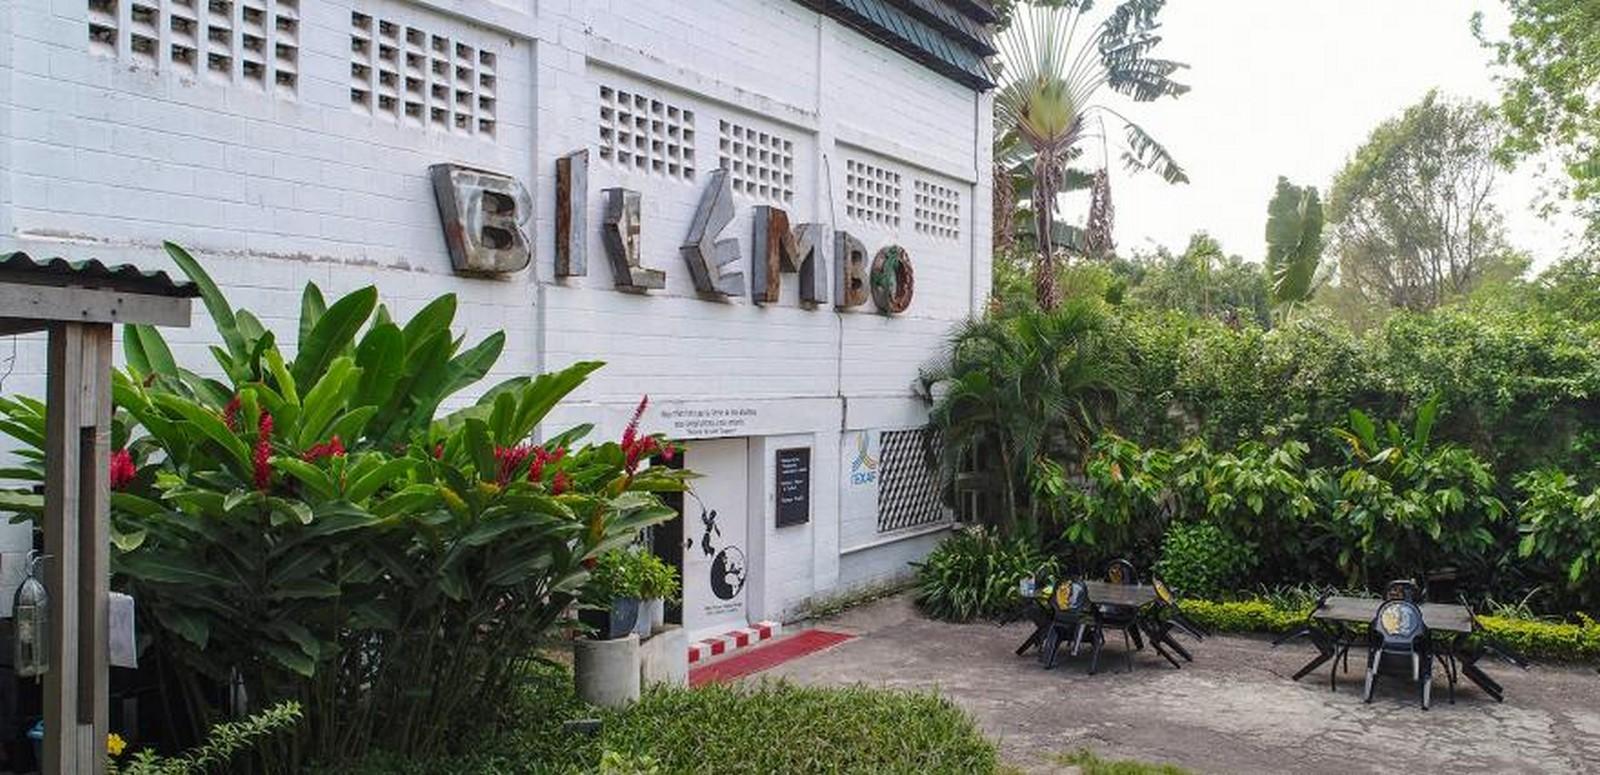 Texaf Bilembo, Kinshasa - sheet2